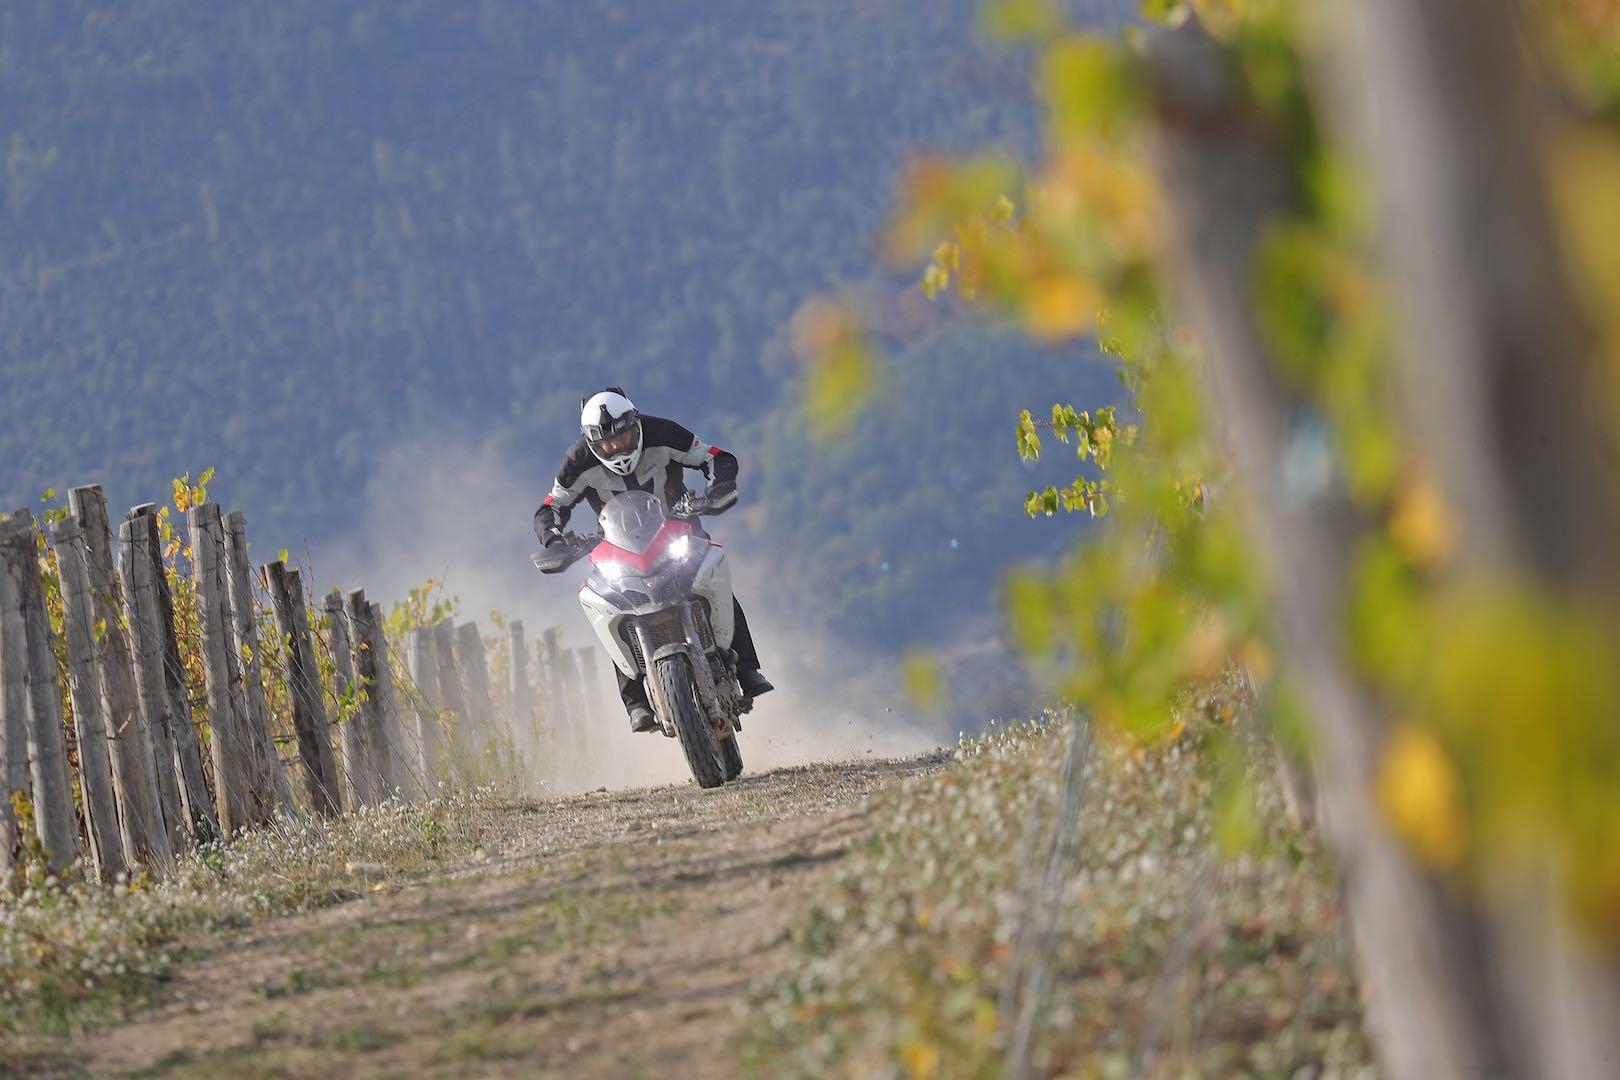 2019 Ducati Multistrada 1260 Enduro Dakar style